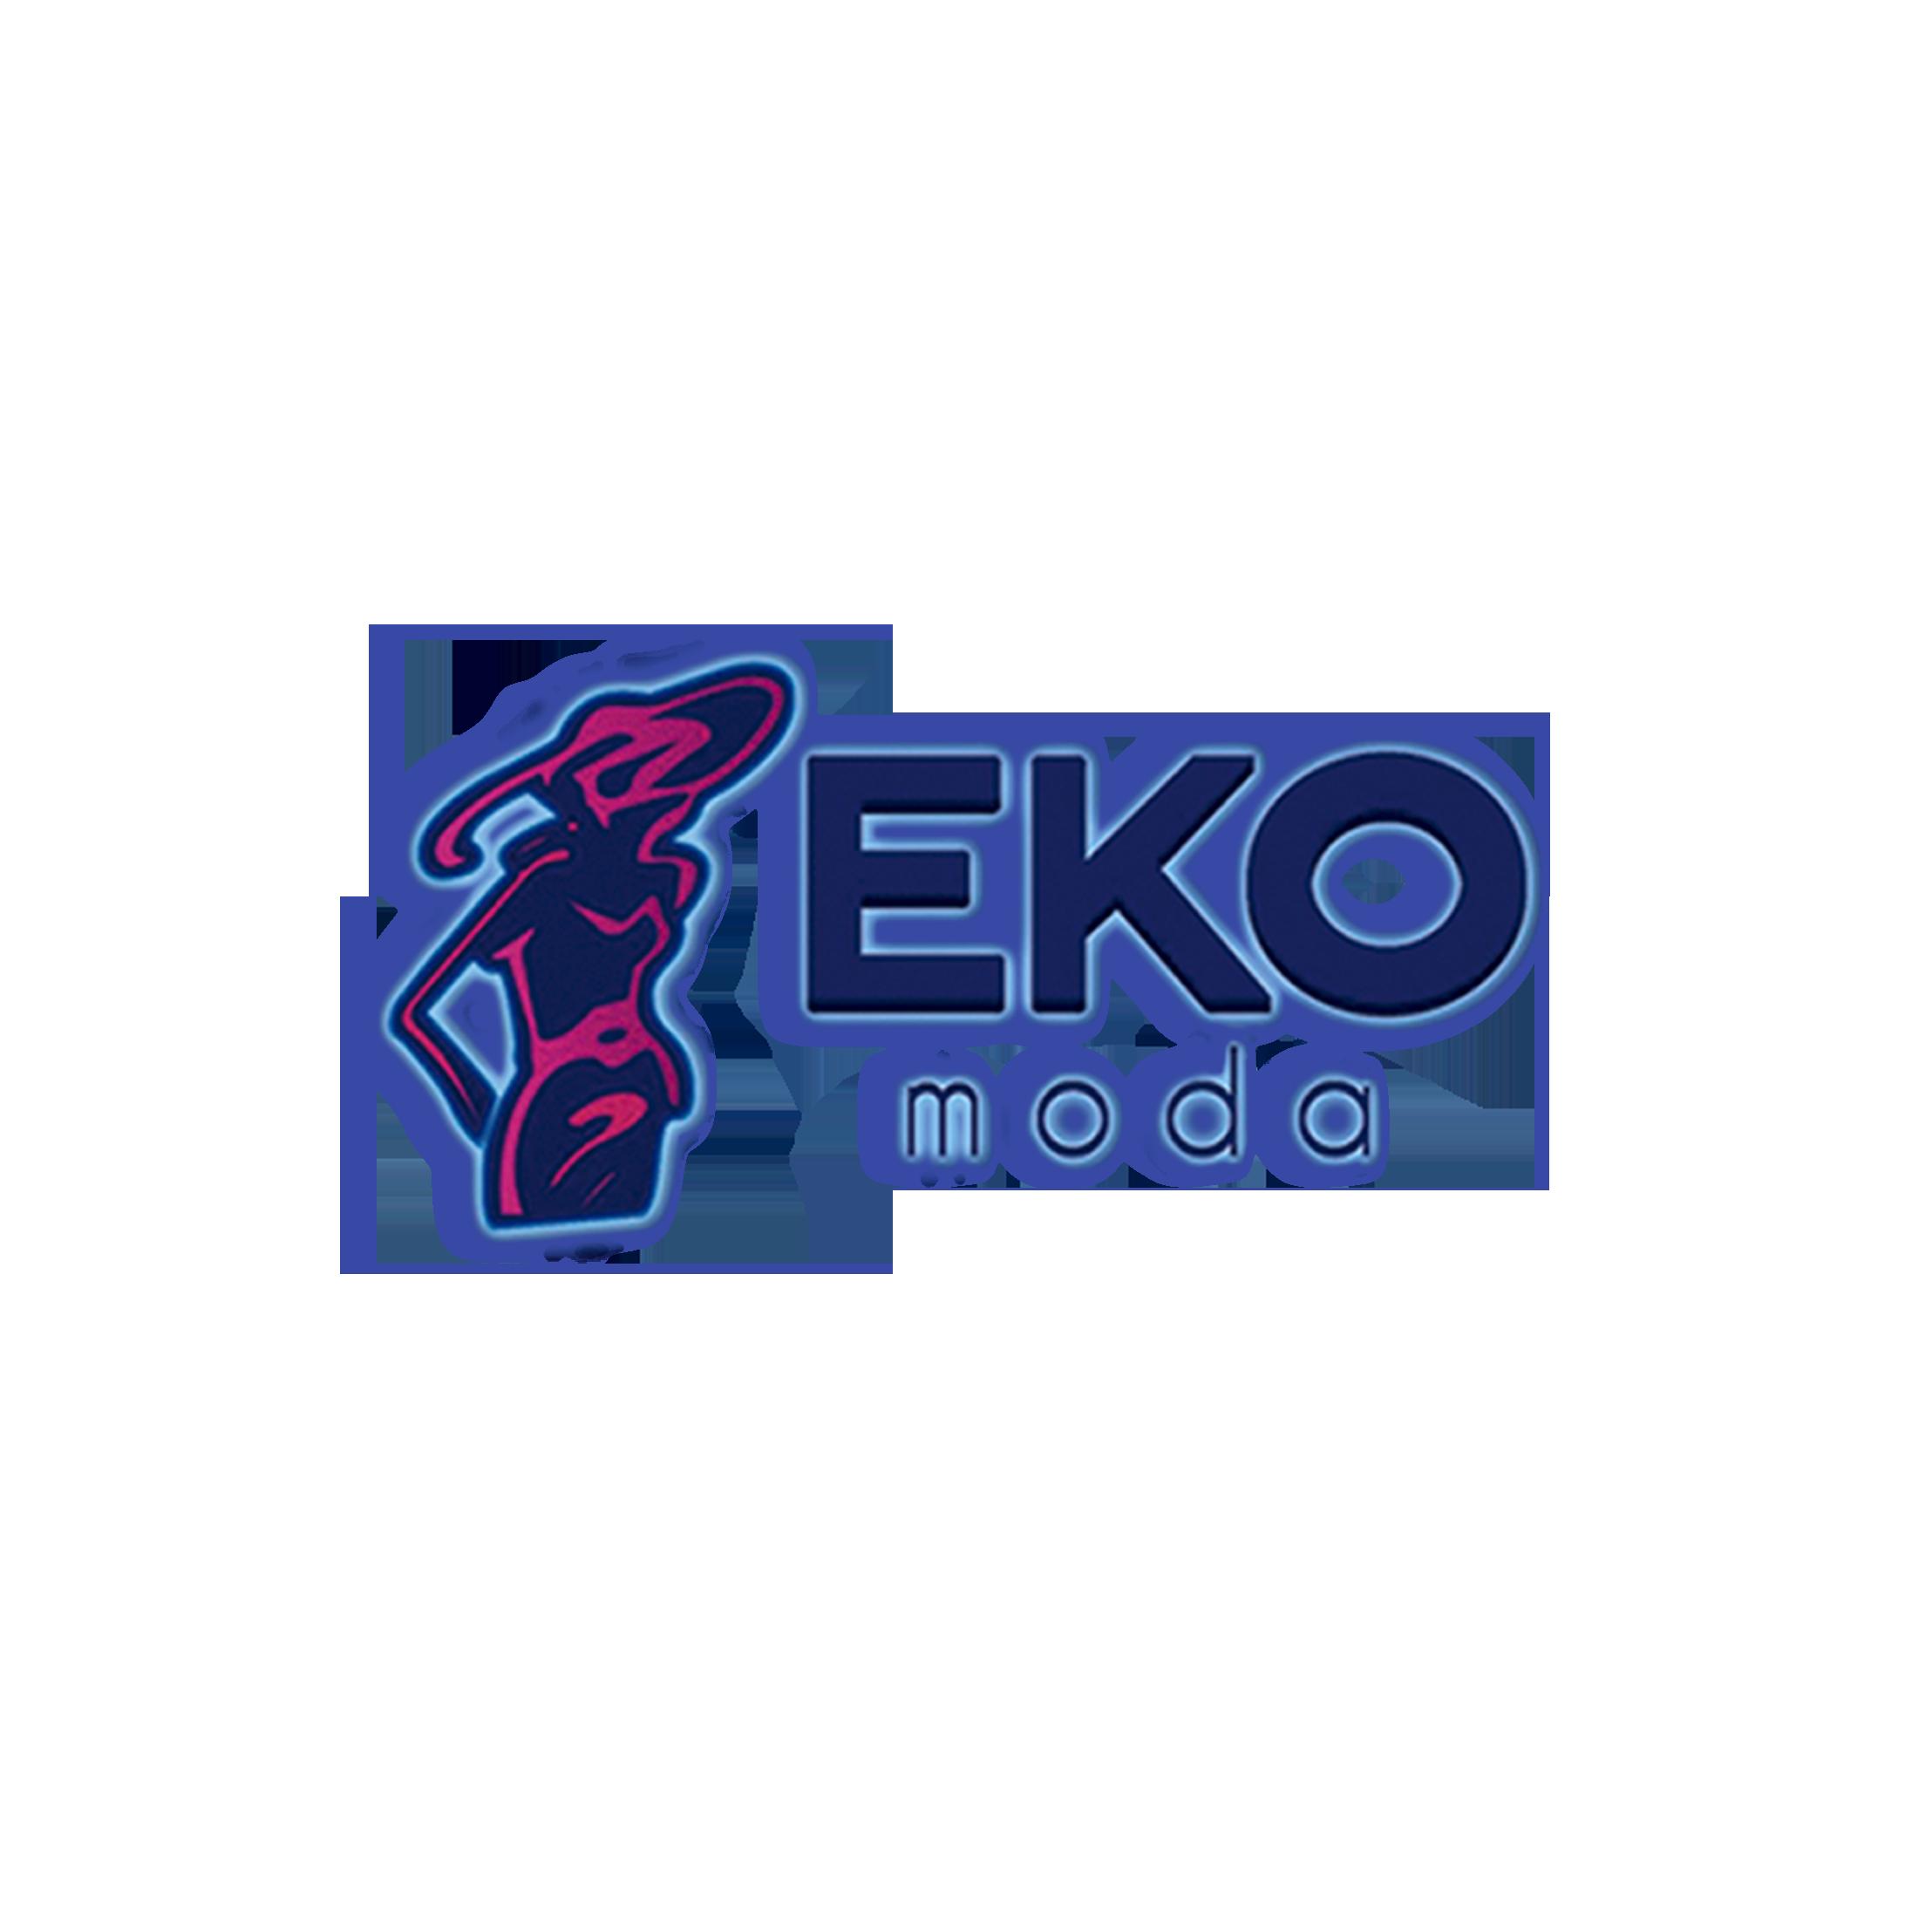 logo-eko-1-1-1-1-1-1-1-1-1-1-1.png